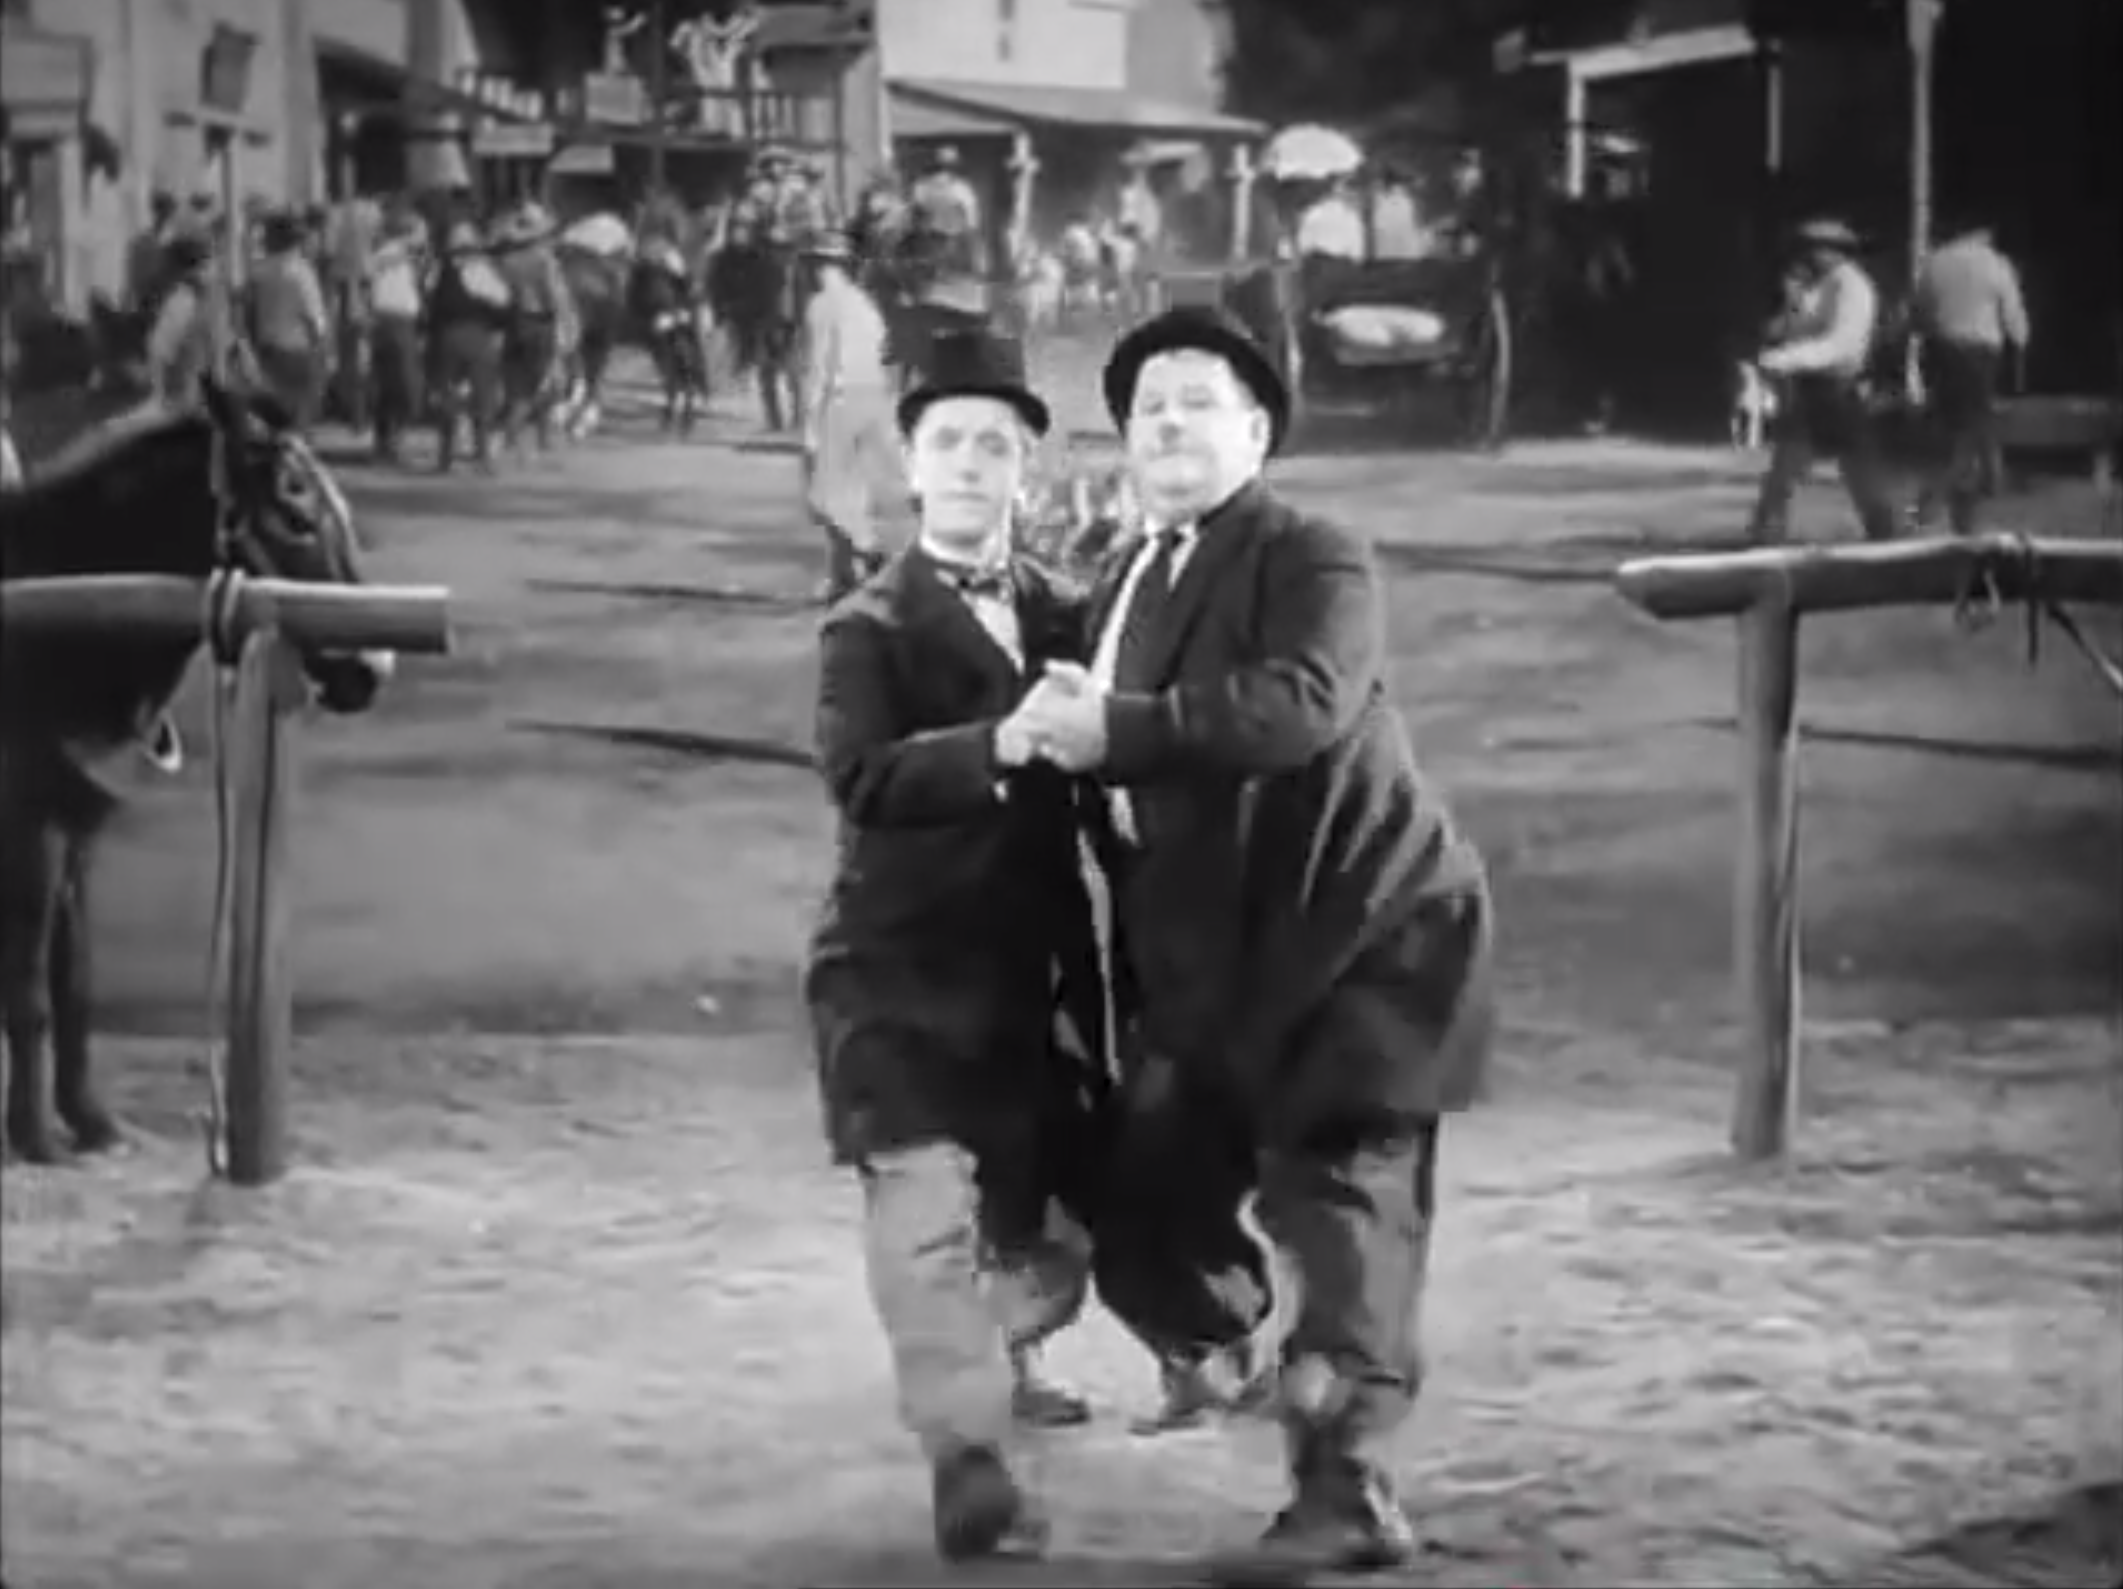 Laurel & Hardy Dance Tango in a Movie, 1937